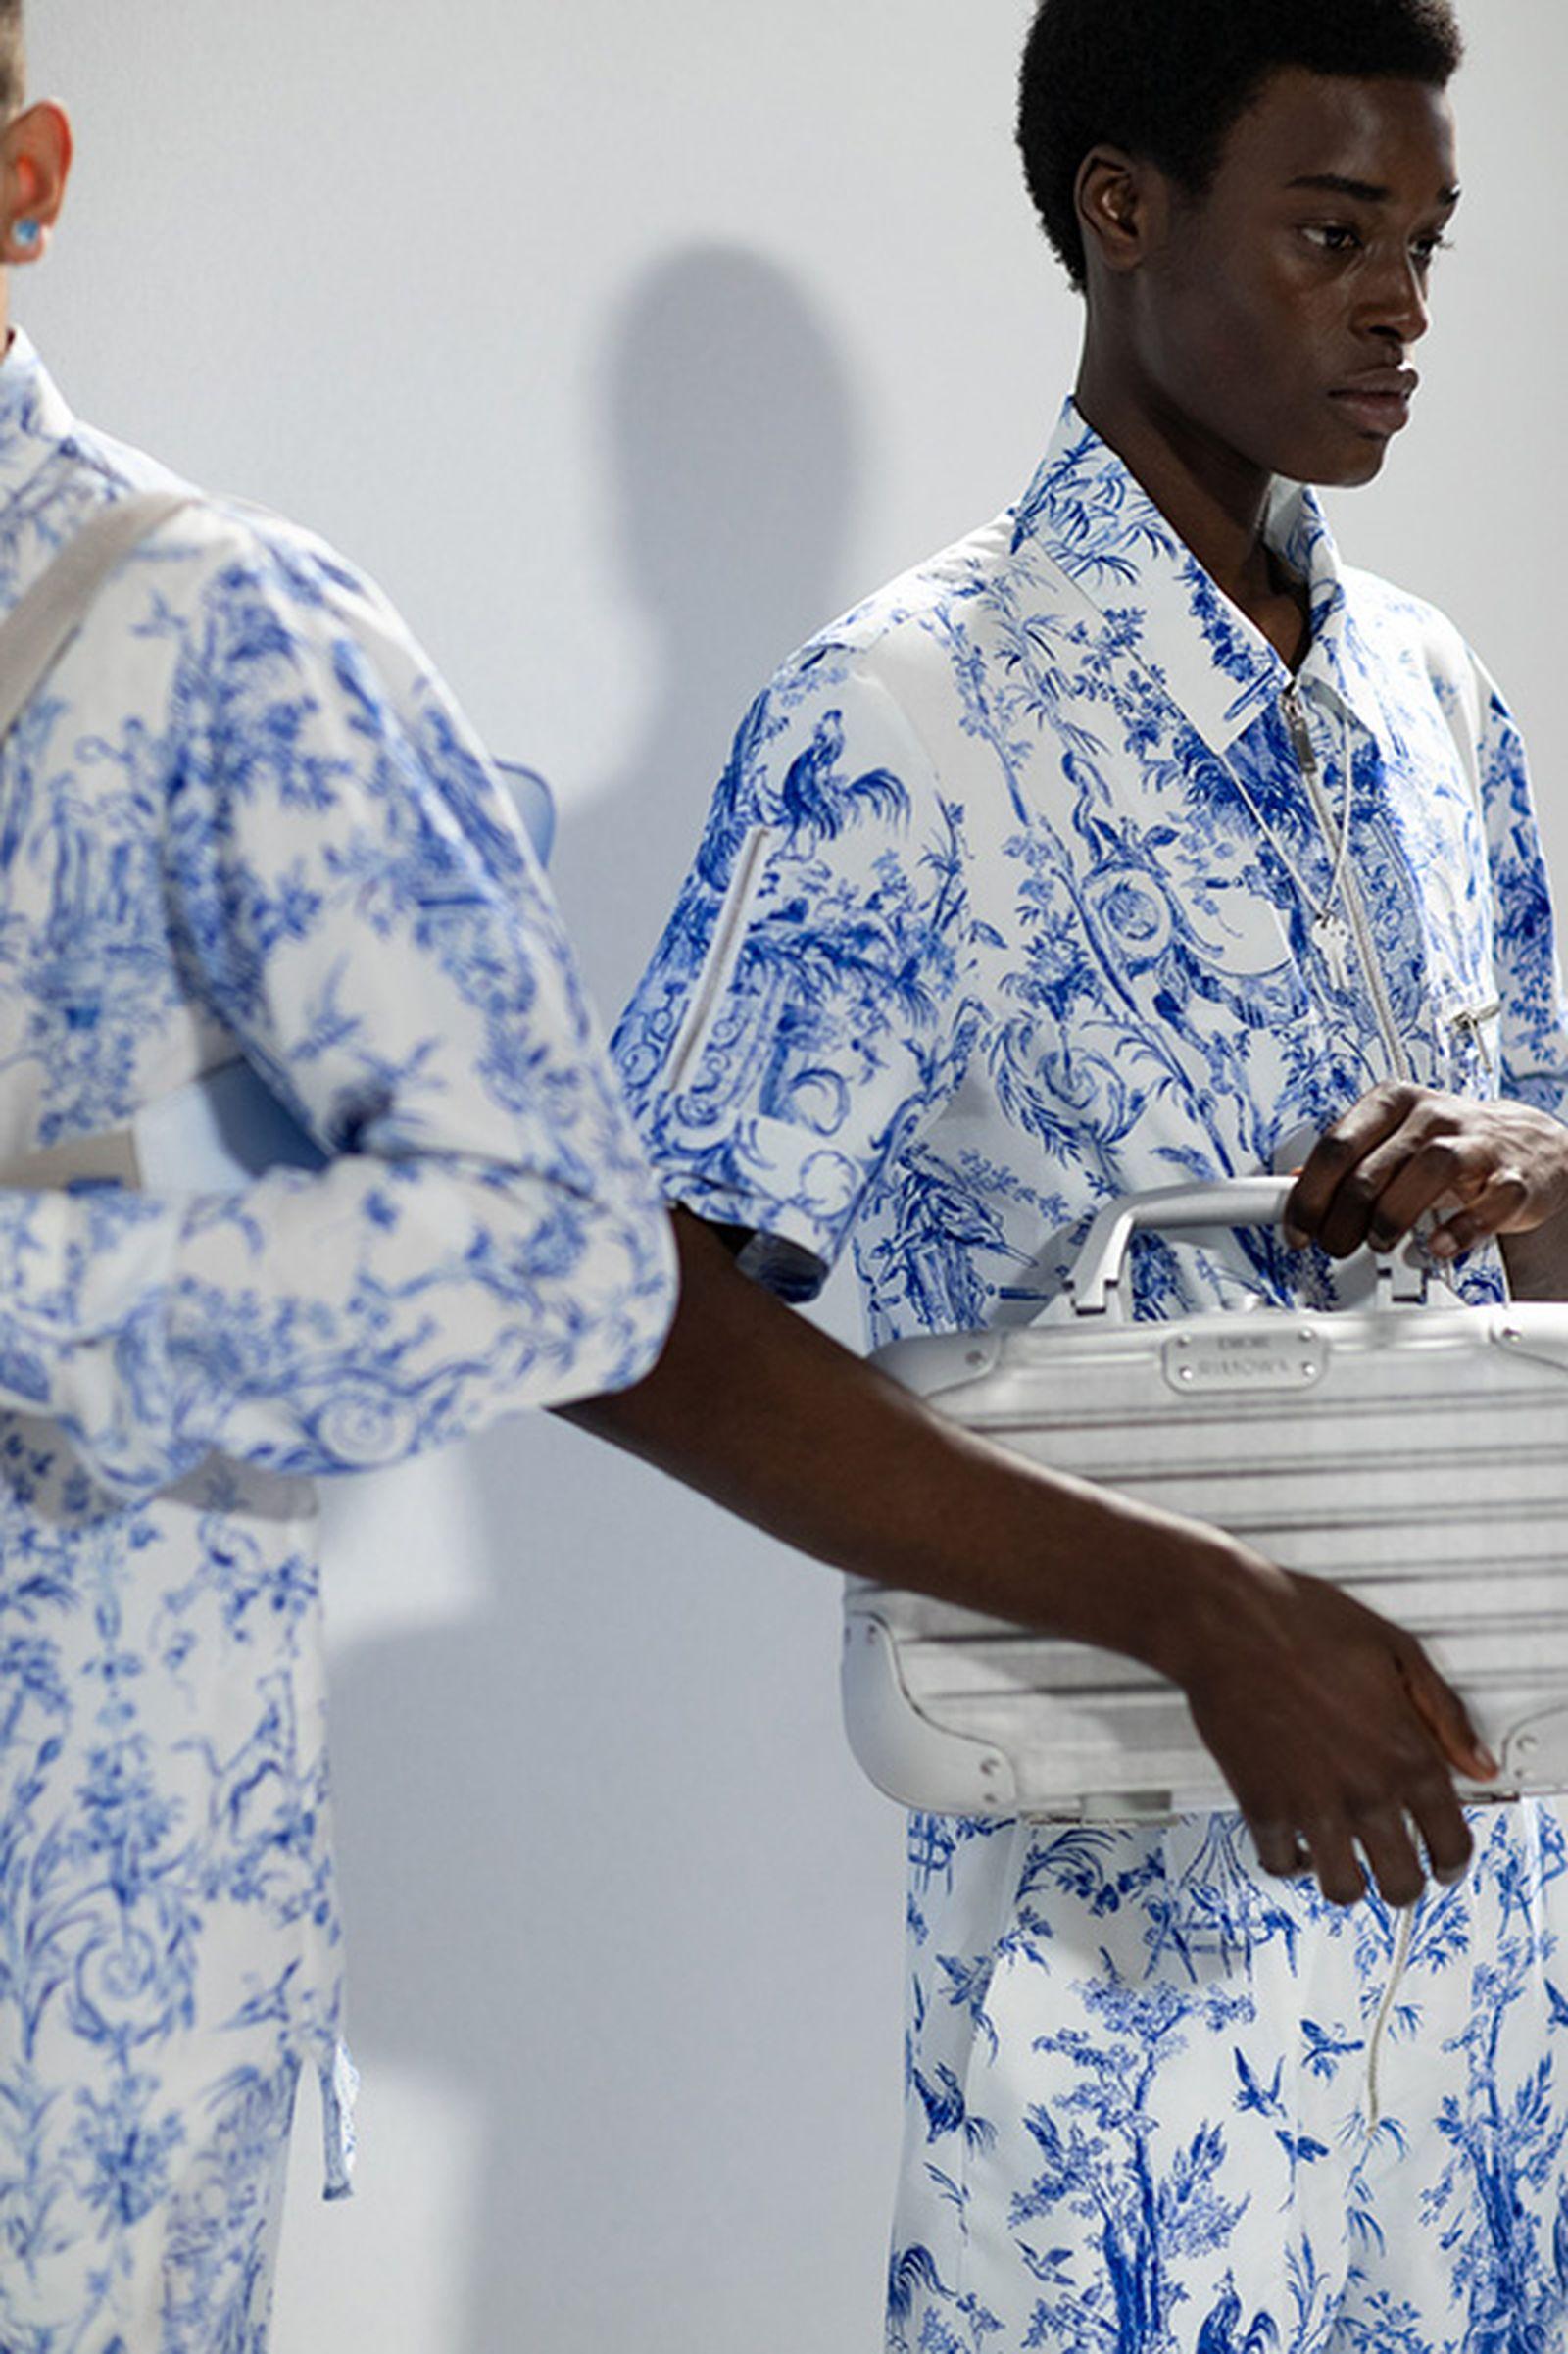 dior rimowa ss20 kim jones paris fashion week